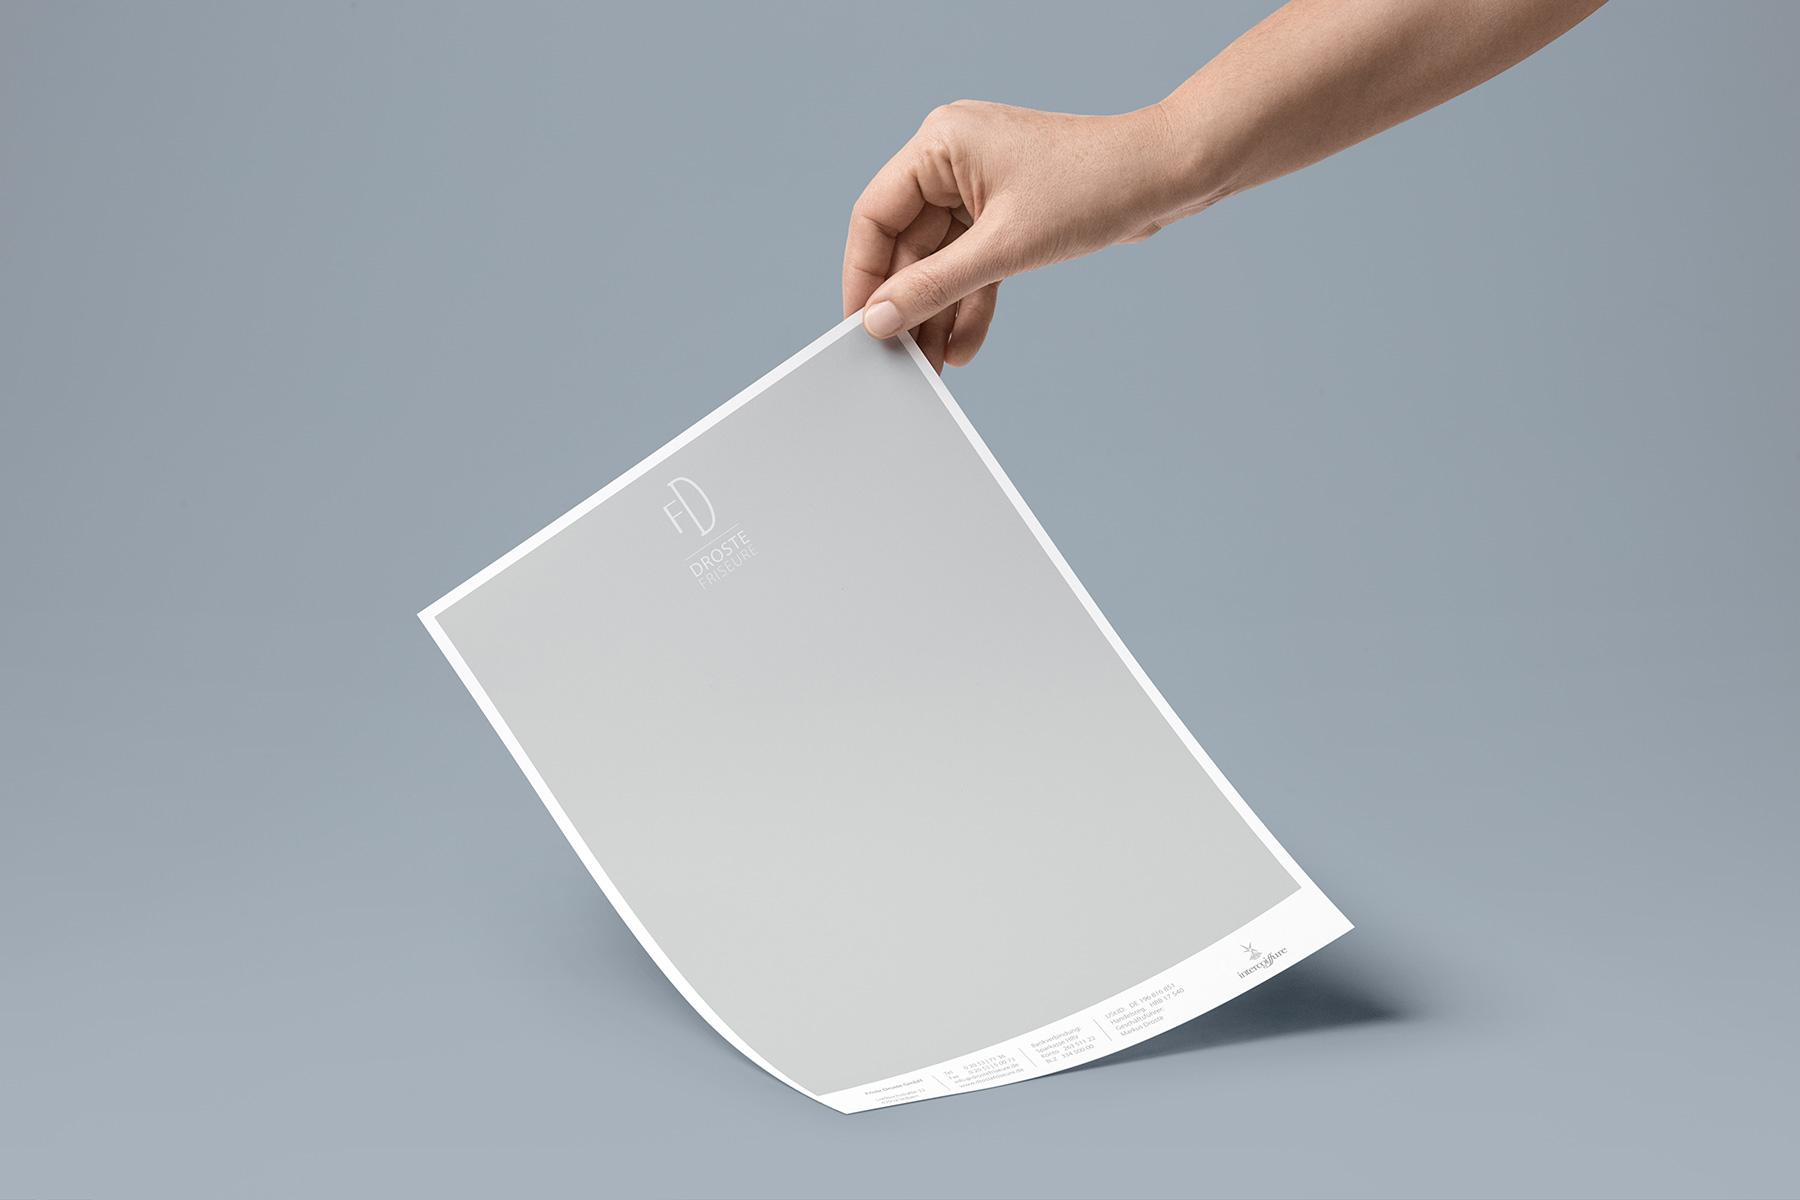 droste-6-Papier-leer(1800x1200)